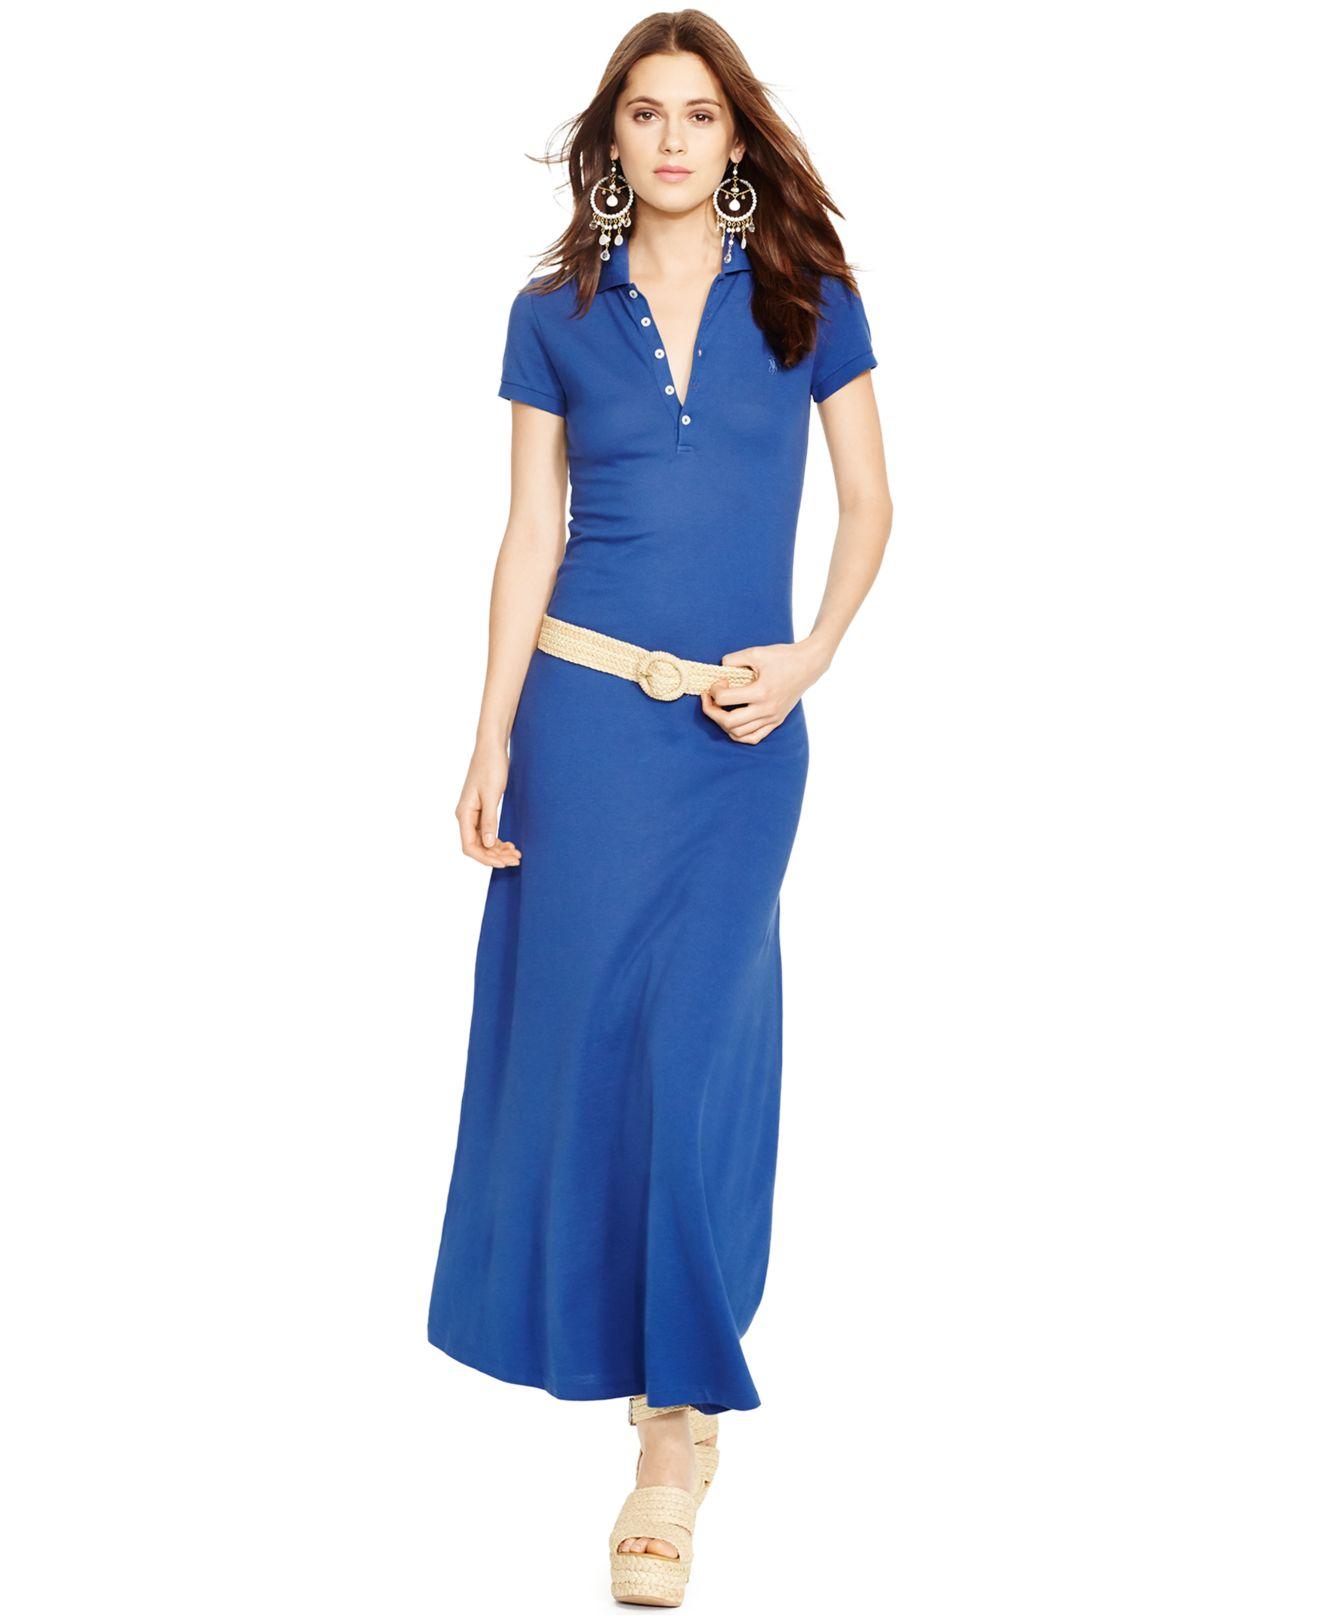 Lastest Sell Ralph Lauren Polo Dress Women Dress Casual Dress Sporty Dress